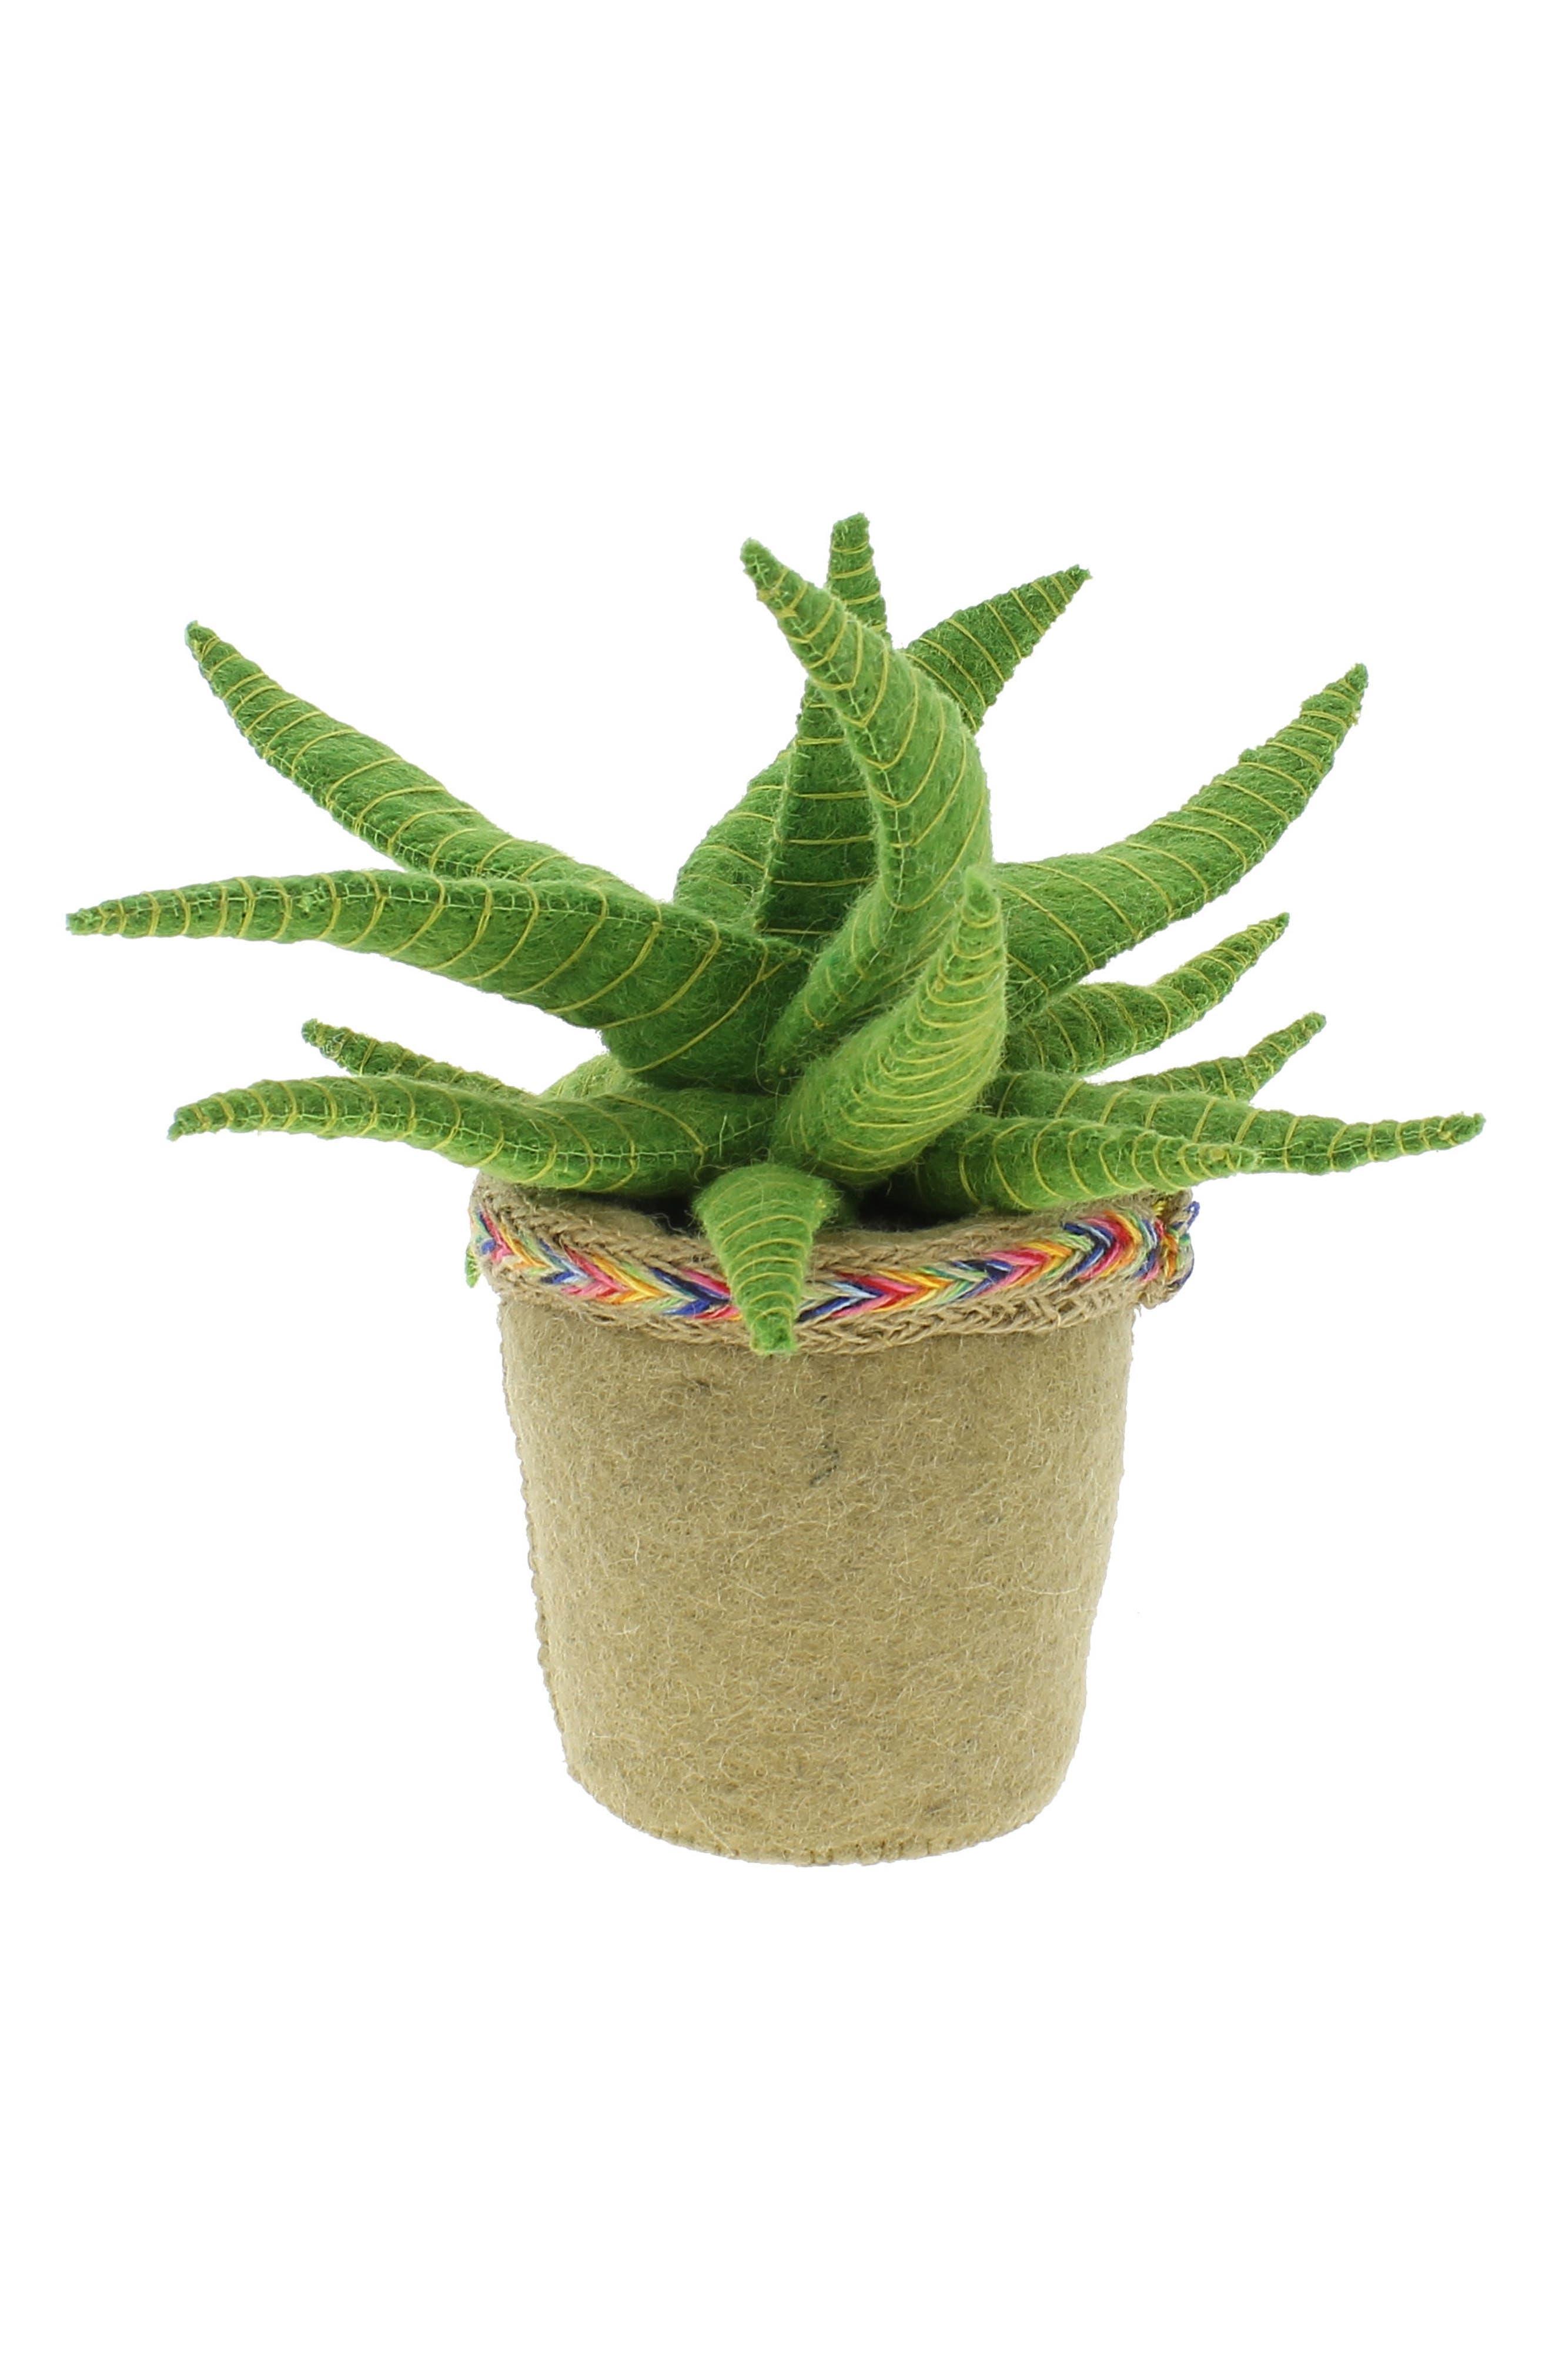 Fiona Walker Stuffed Aloe Vera Cactus Weighted Bookend